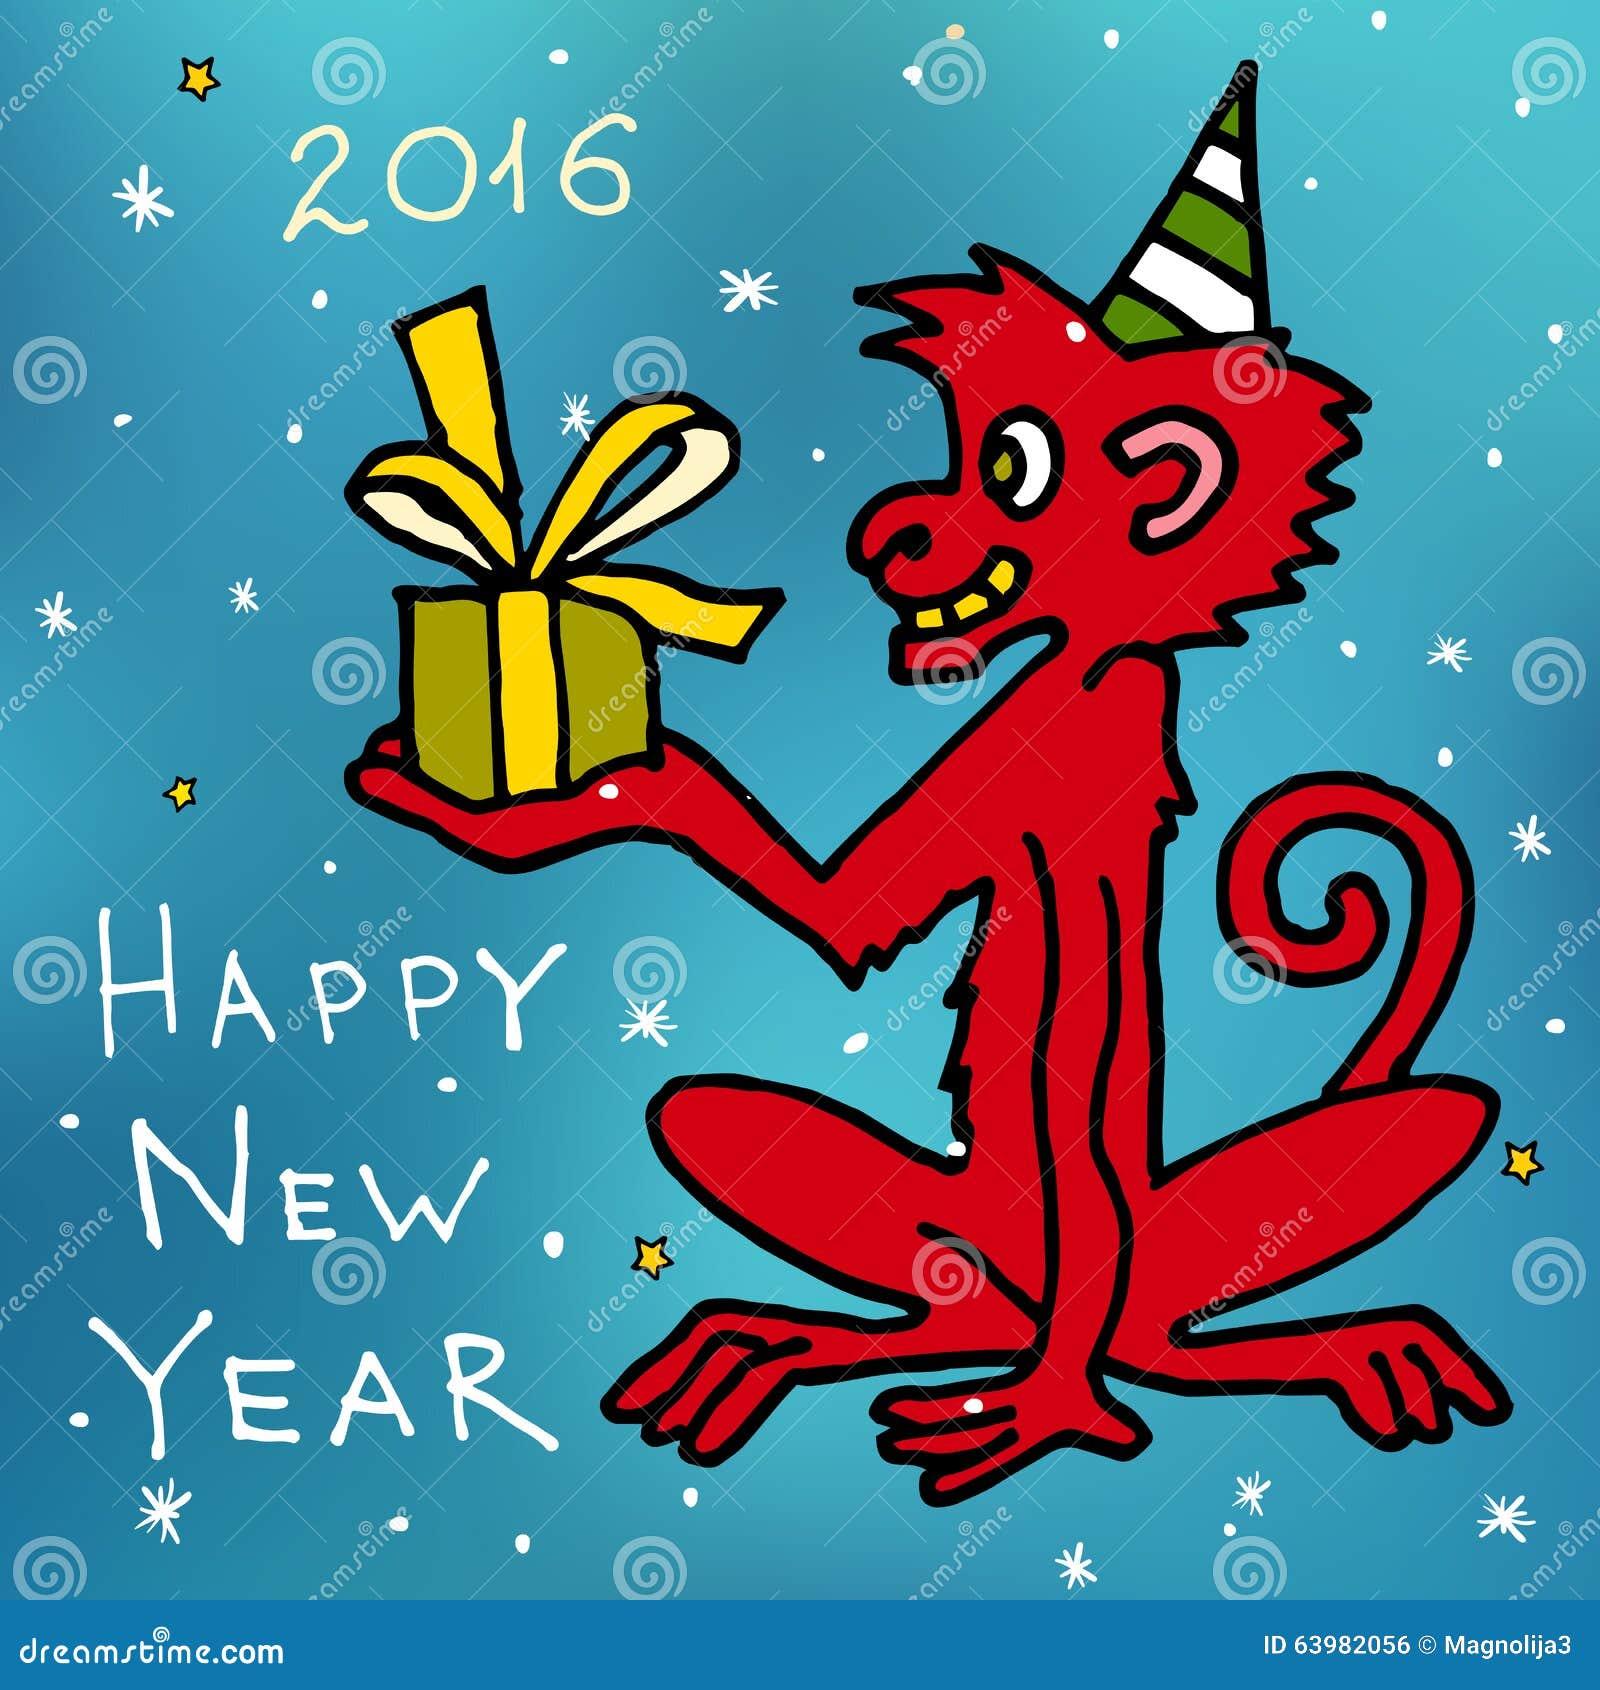 Happy New Year! - Cards - Cartoons - Cinema - Conversation Happy new year cartoons pictures